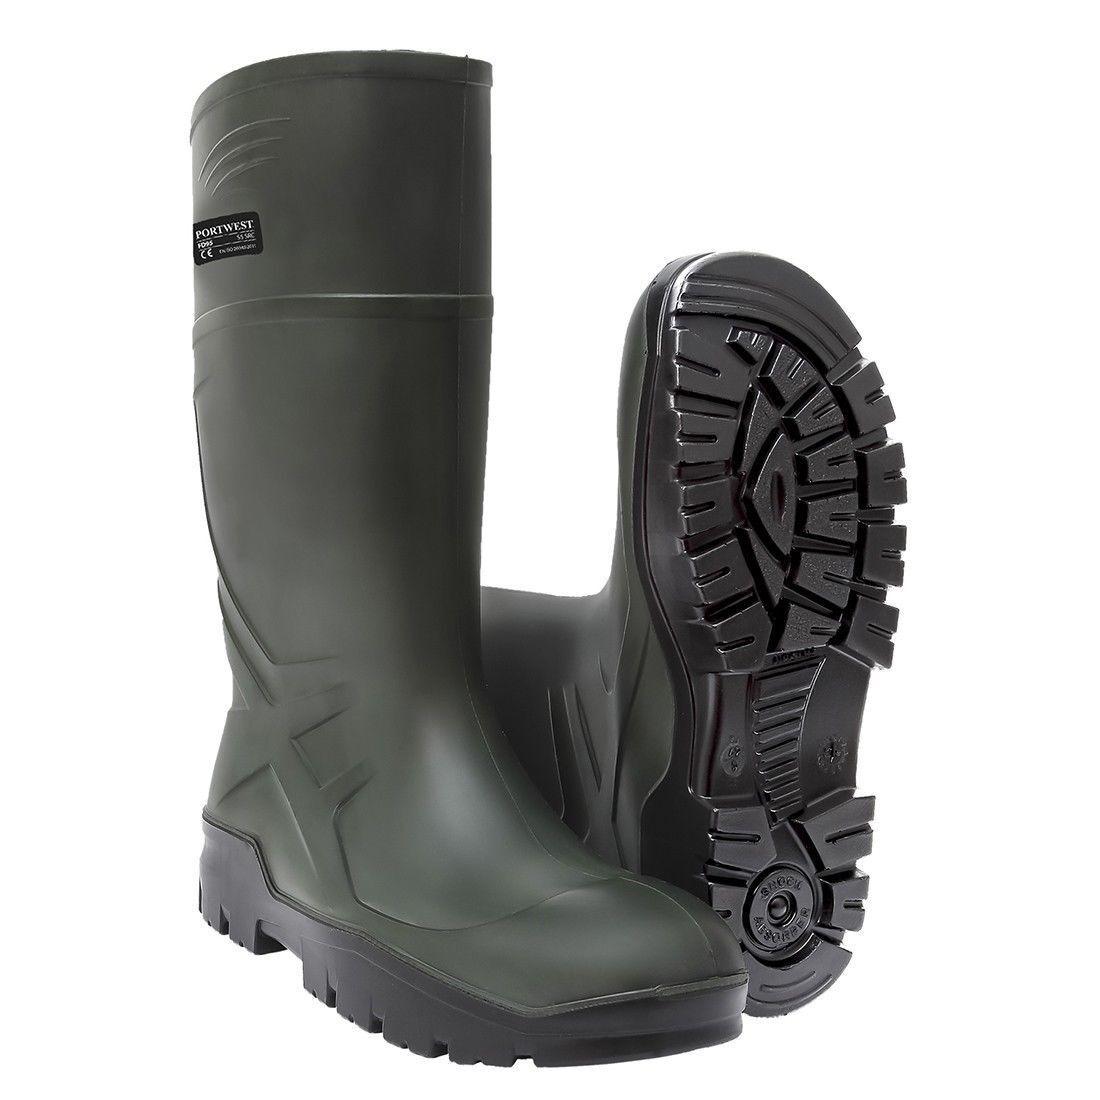 Portwest Wellington Thermal Wellies Lightweight Boots Like Dunlop Purofort FD90